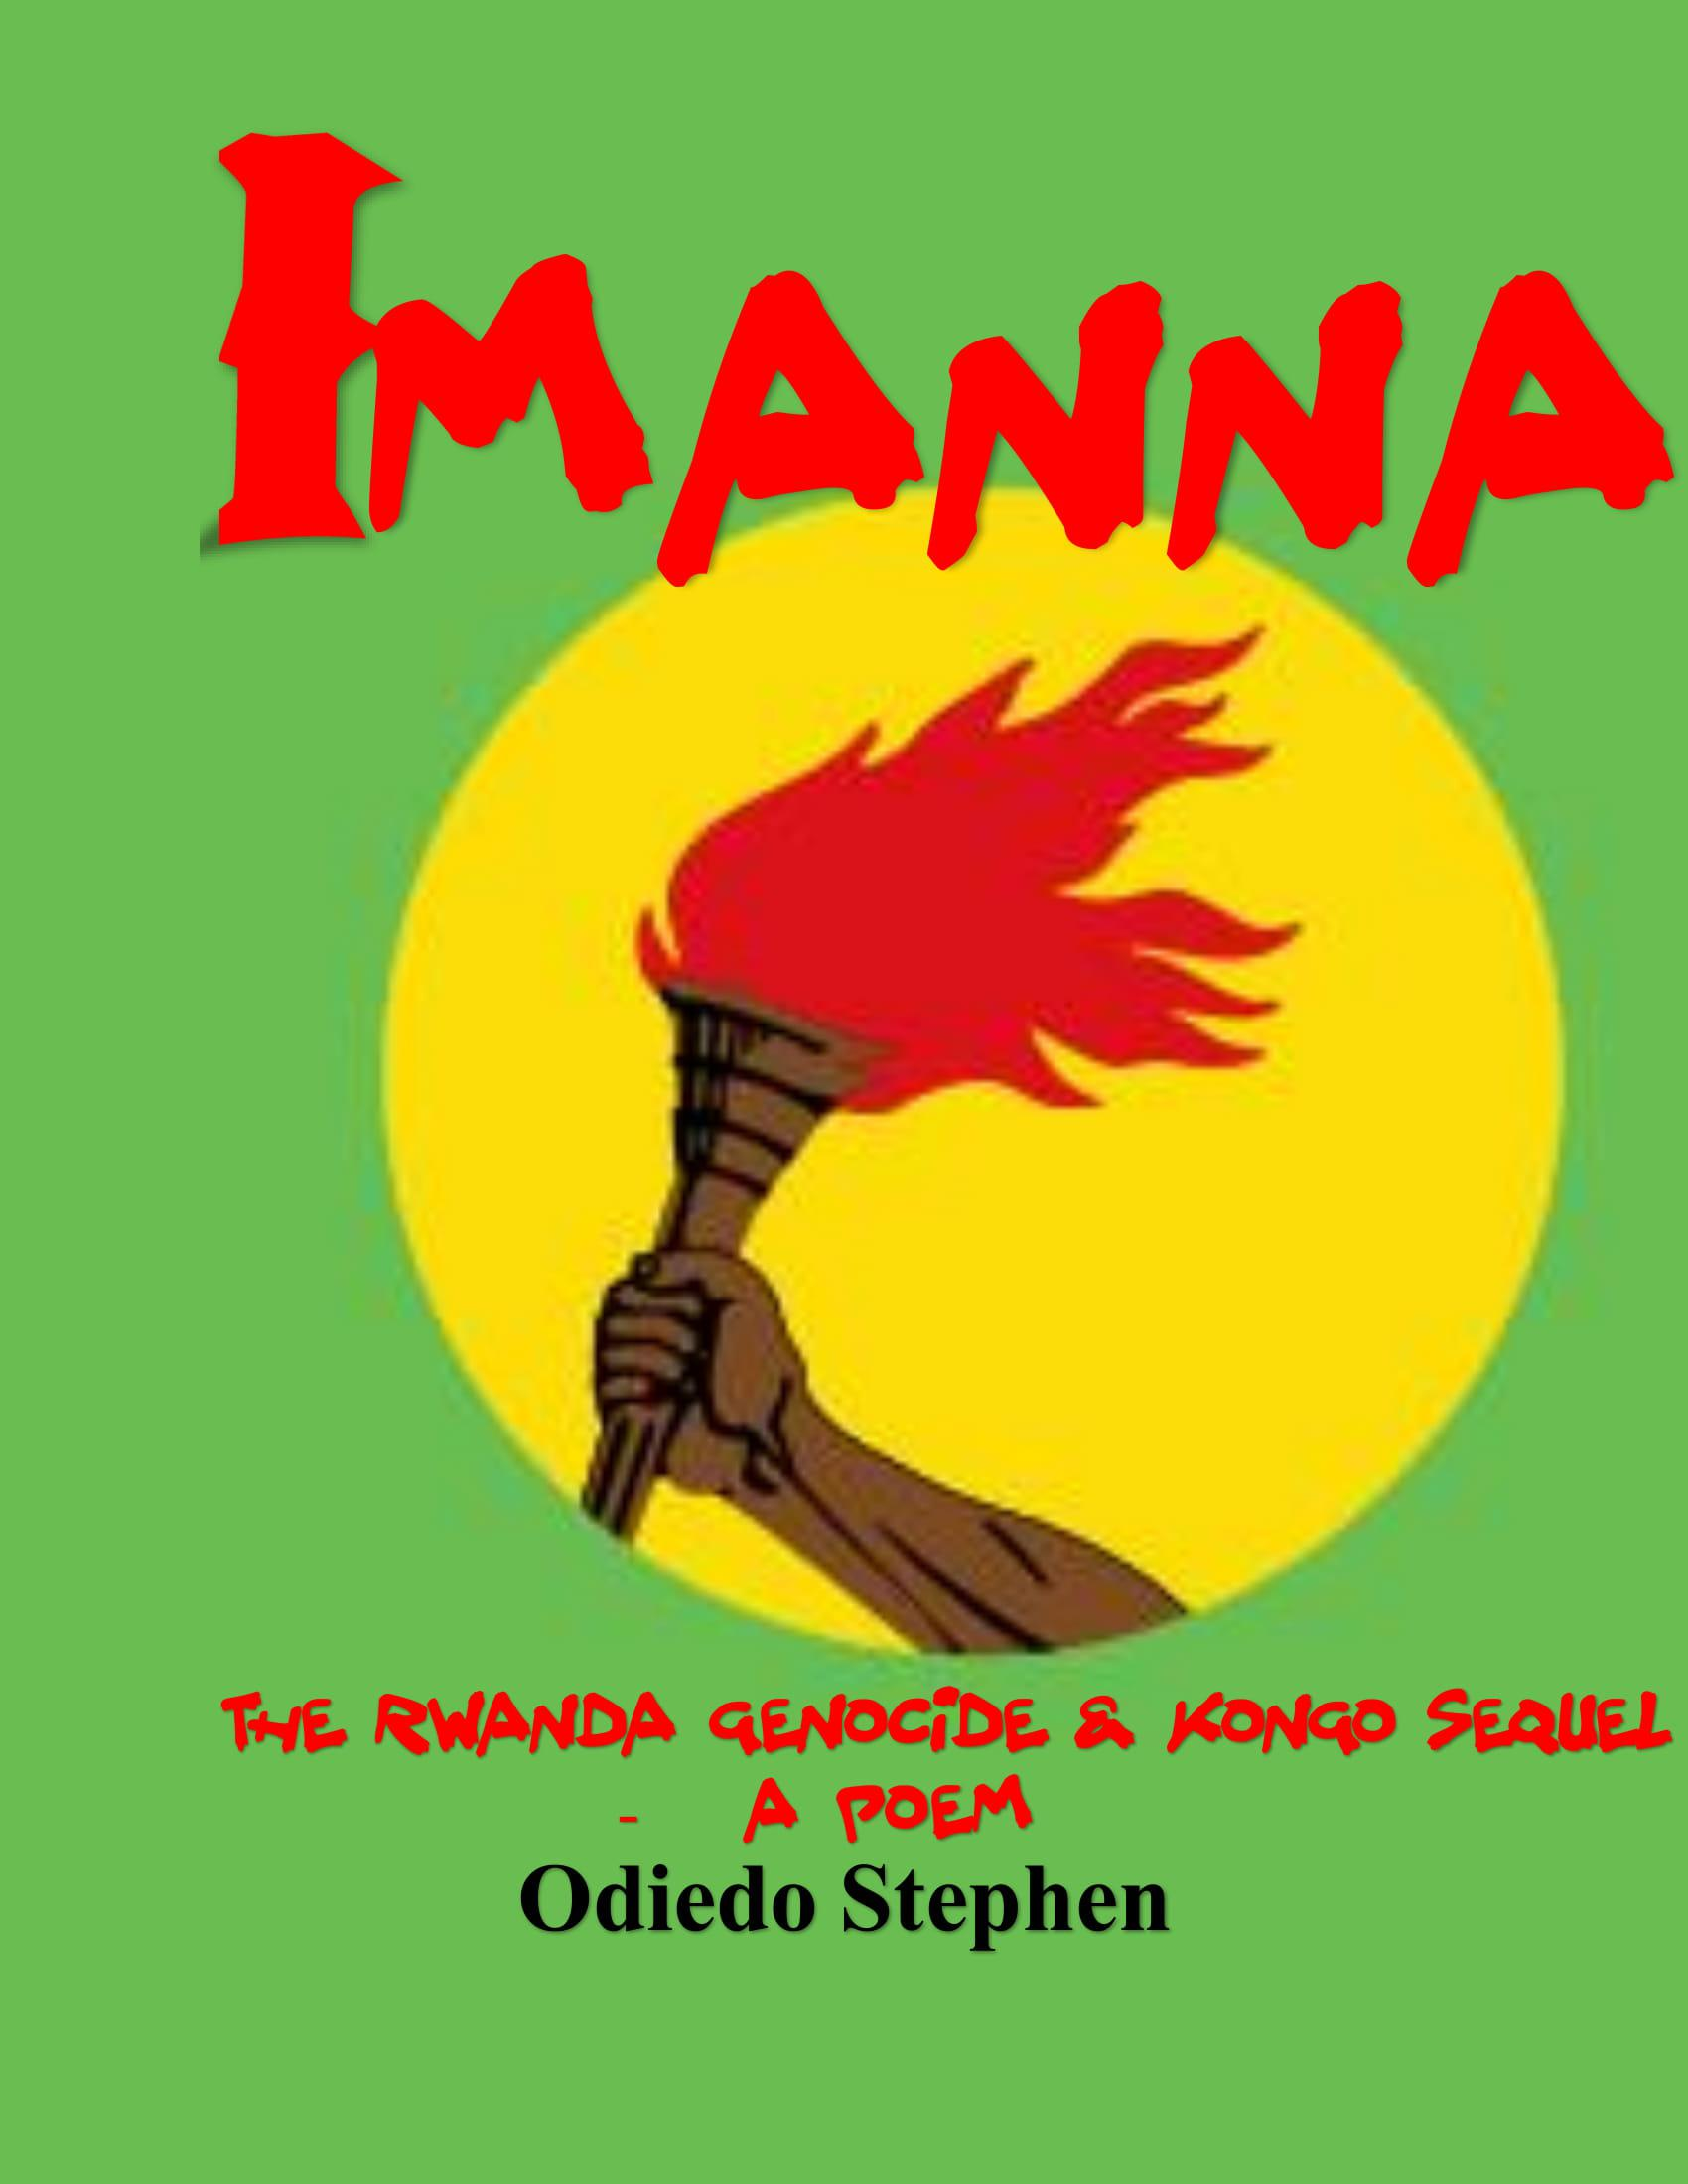 Imanna - an Epic Poem on The Rwanda Genocide